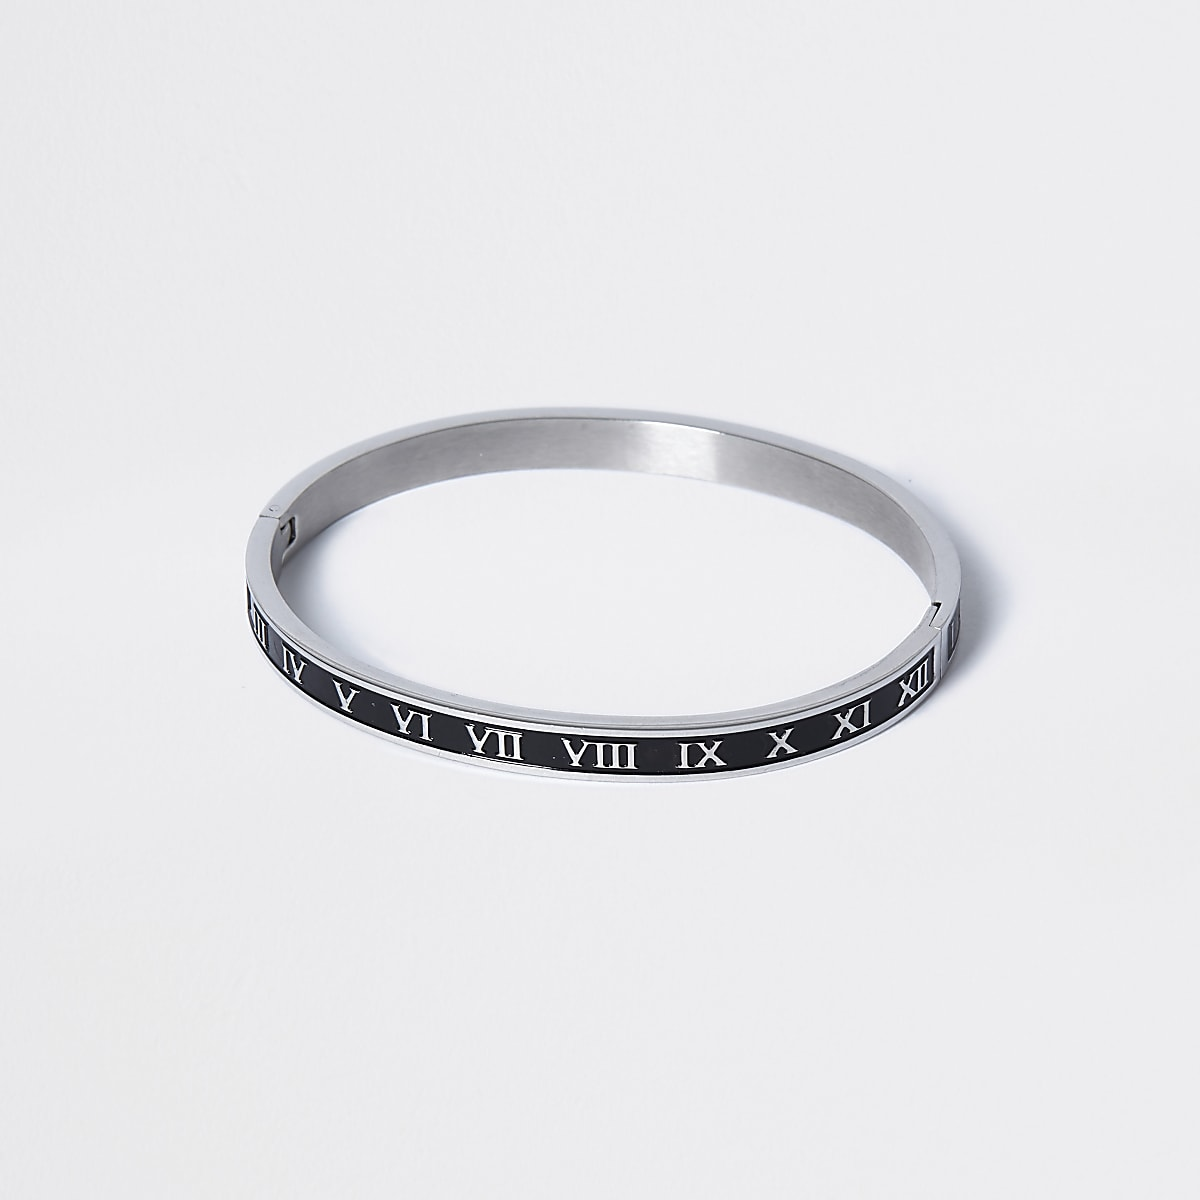 Silver enamel roman numeral bangle